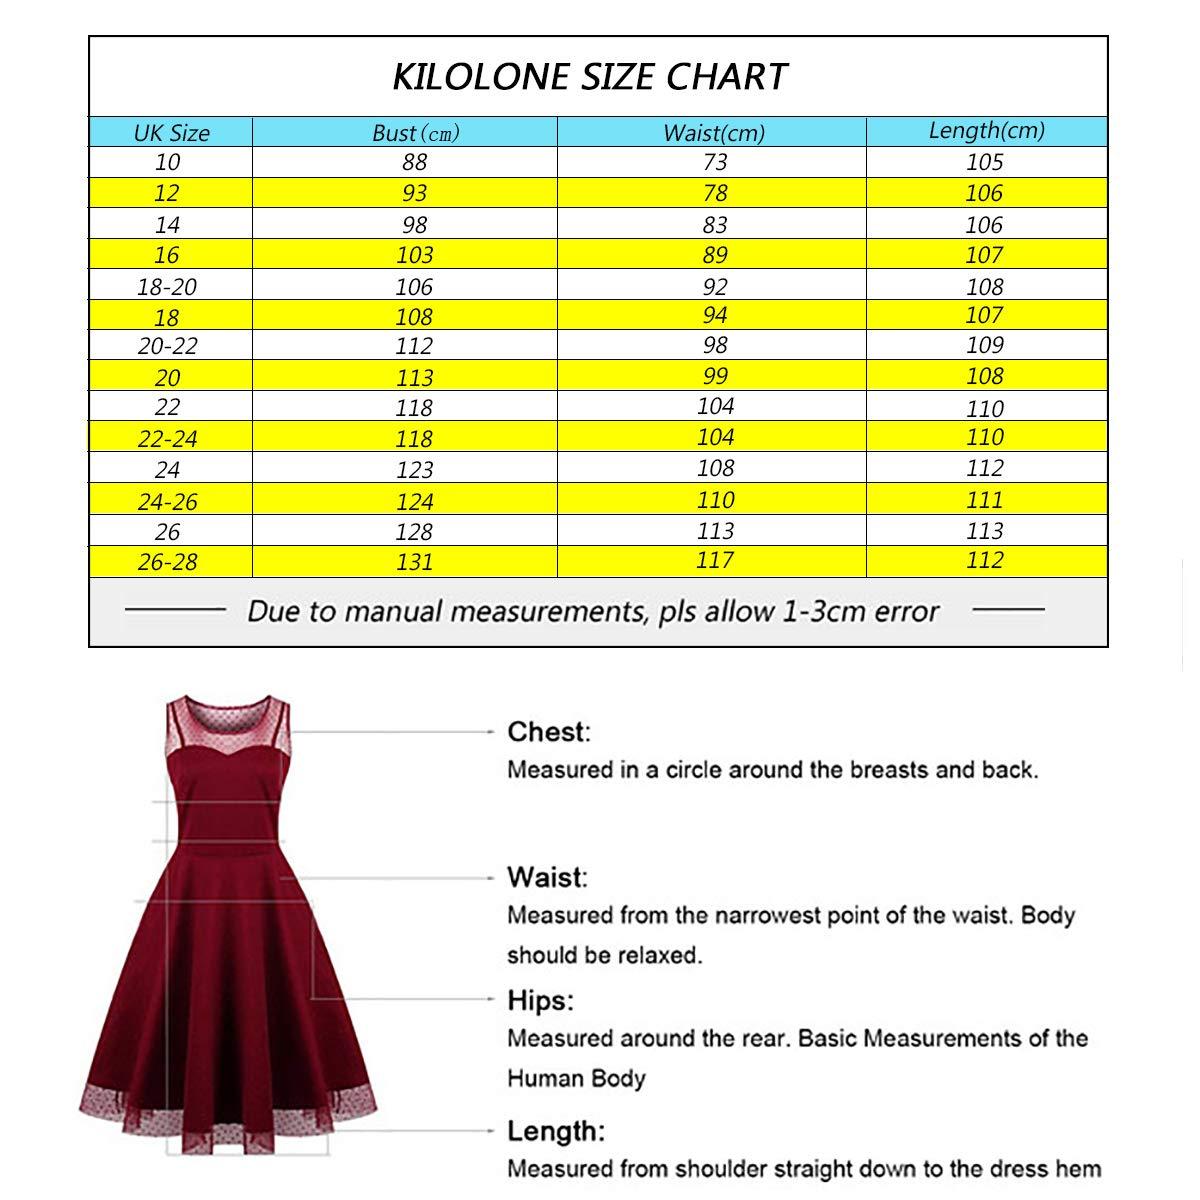 Kilolone Damen Plus Size Kleid 1950er Cocktailkleid Jahrgang Kleider Spitzenkleid Langarm Knielang Rockabilly Kleid S 6xl Sidra Hospital